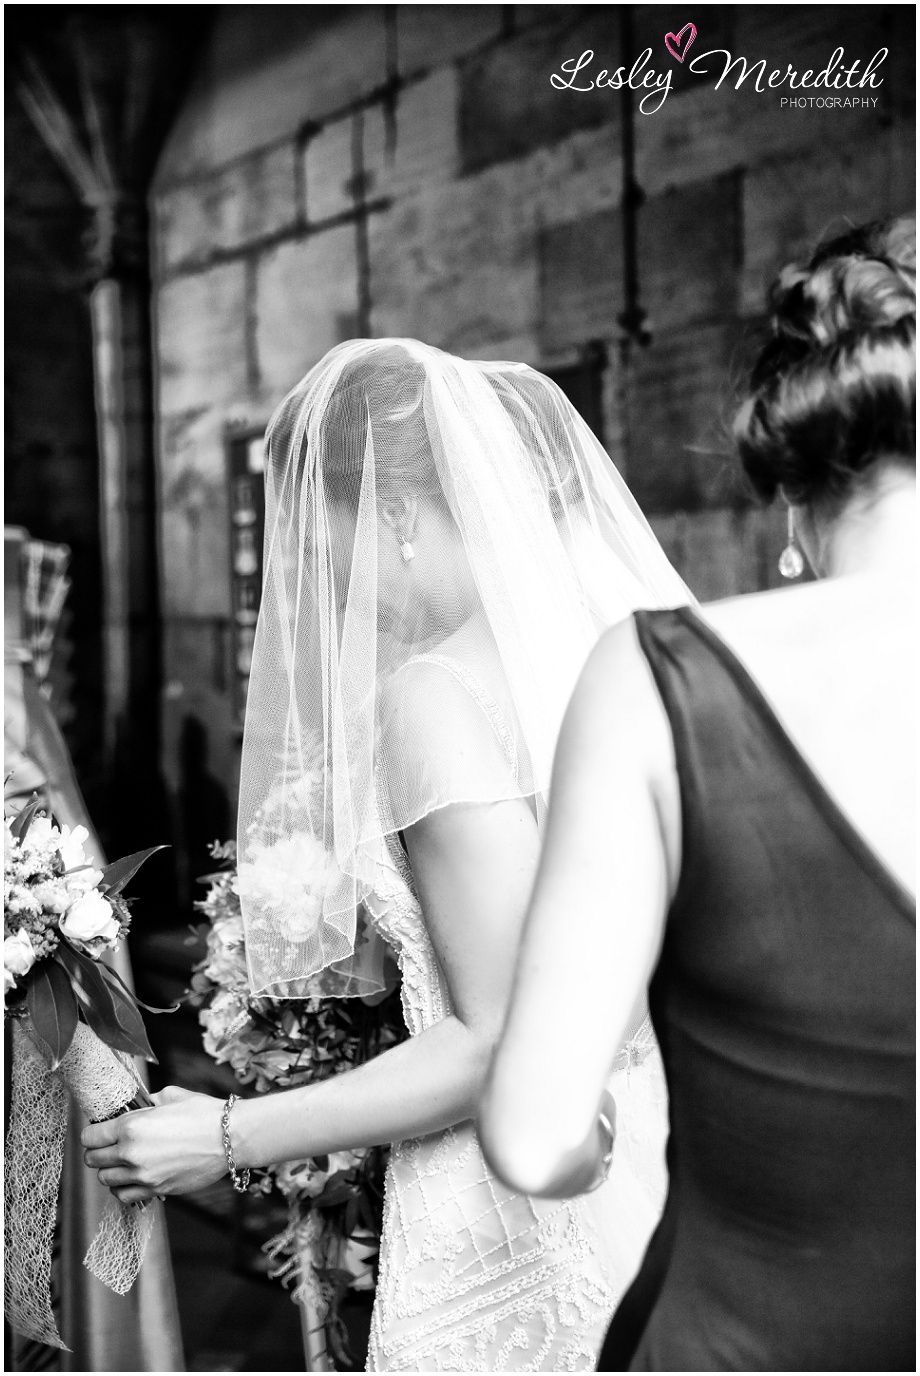 Lesley Meredith Photoghraphy  (36)